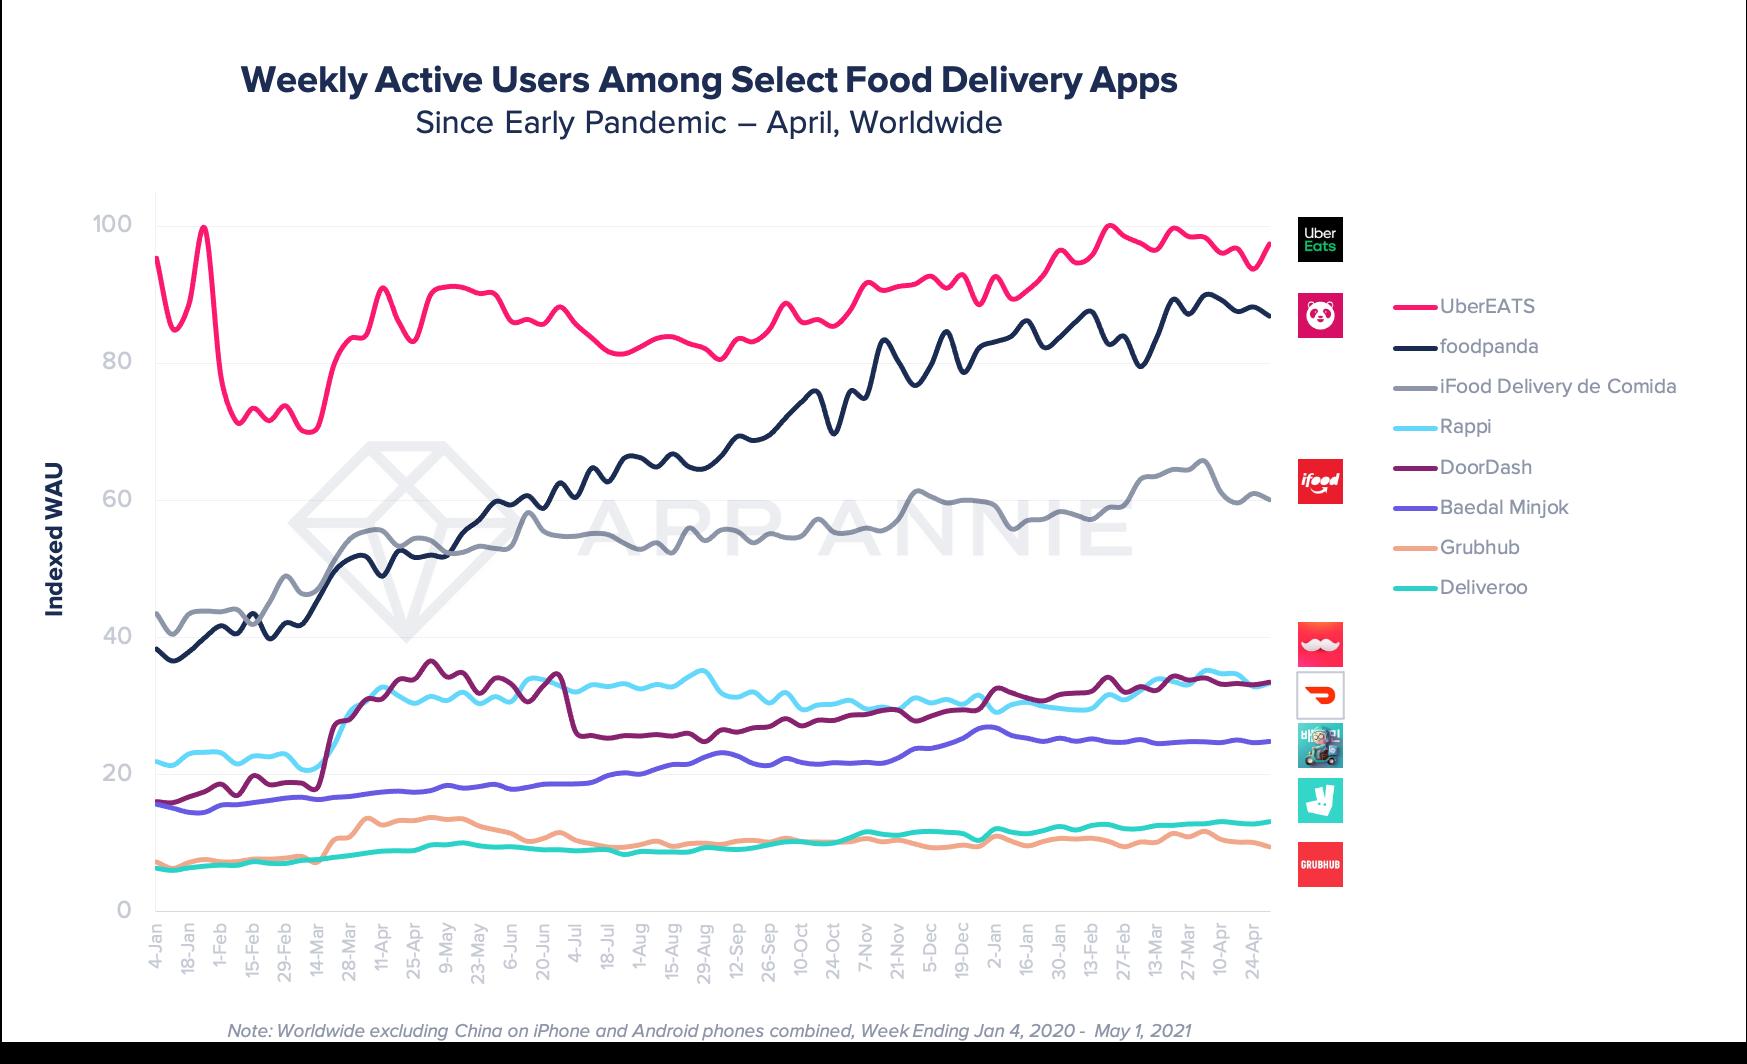 DoorDash Ranked #1 Among US Food Apps Despite Indoor Dining Reopening